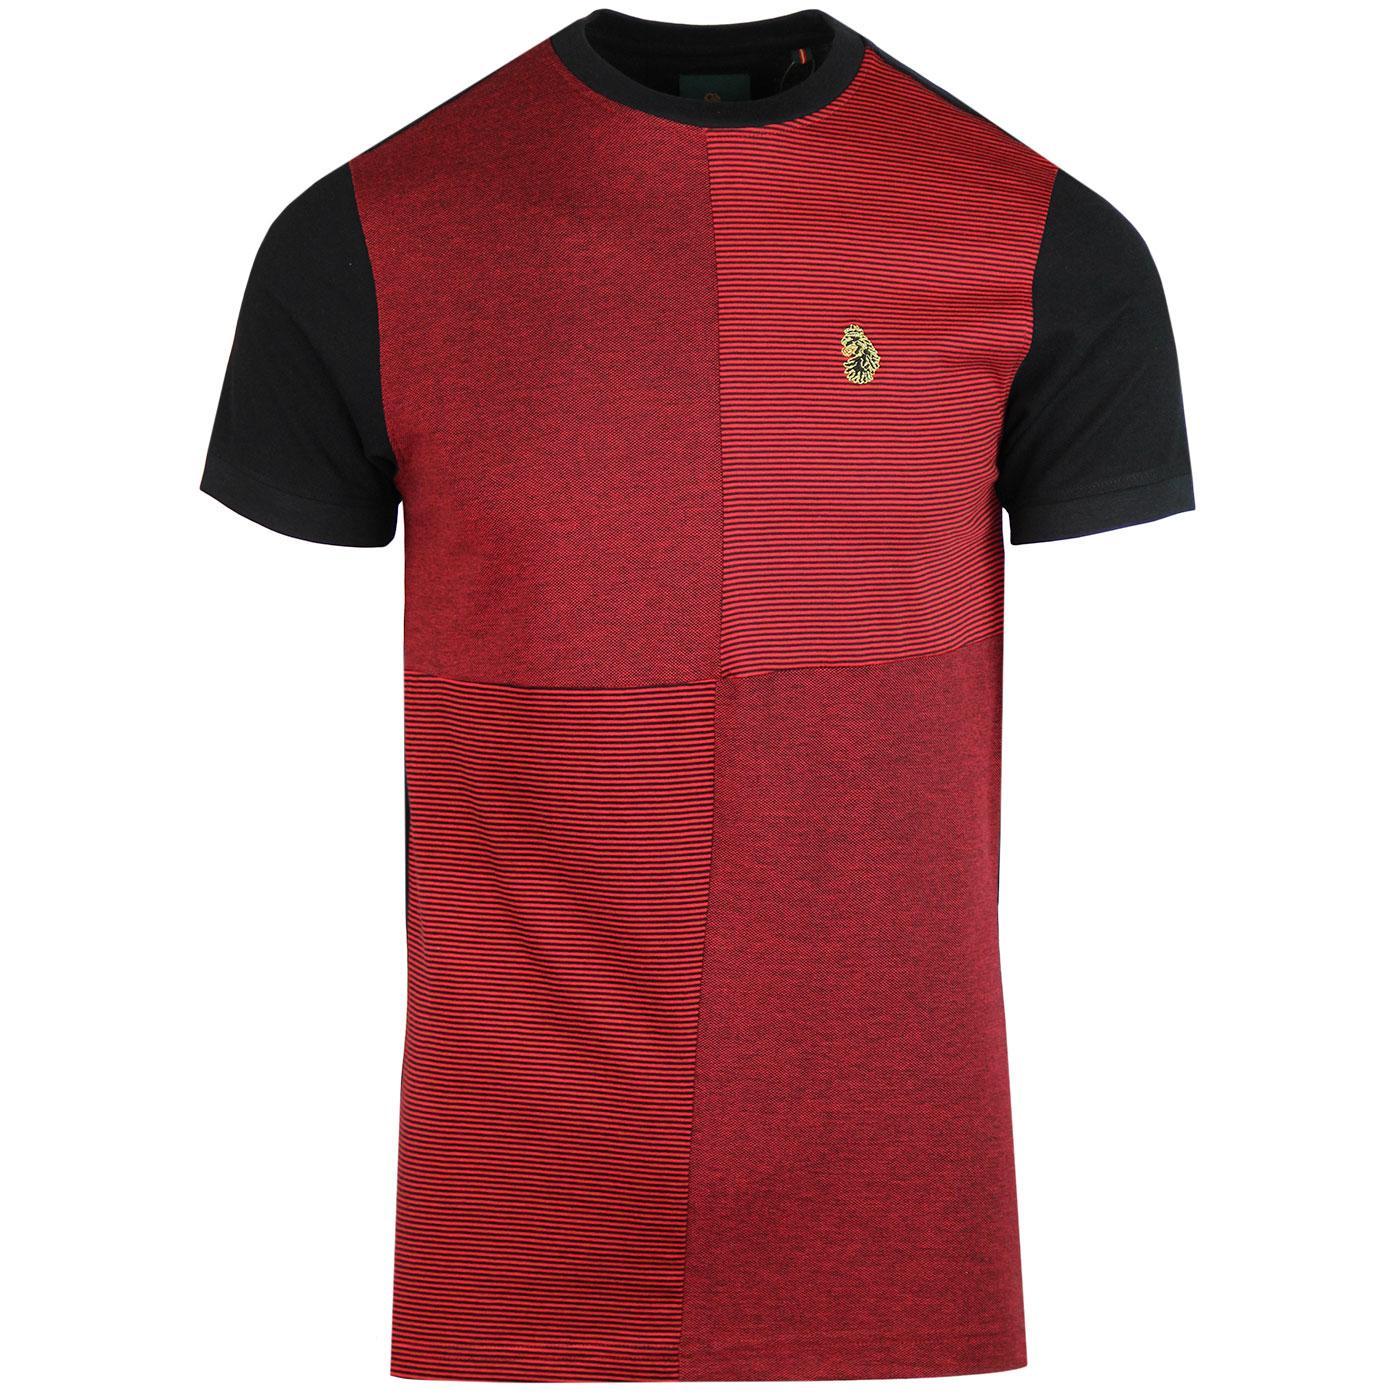 Boozy Baz LUKE 1977 Retro Colour Block T-Shirt